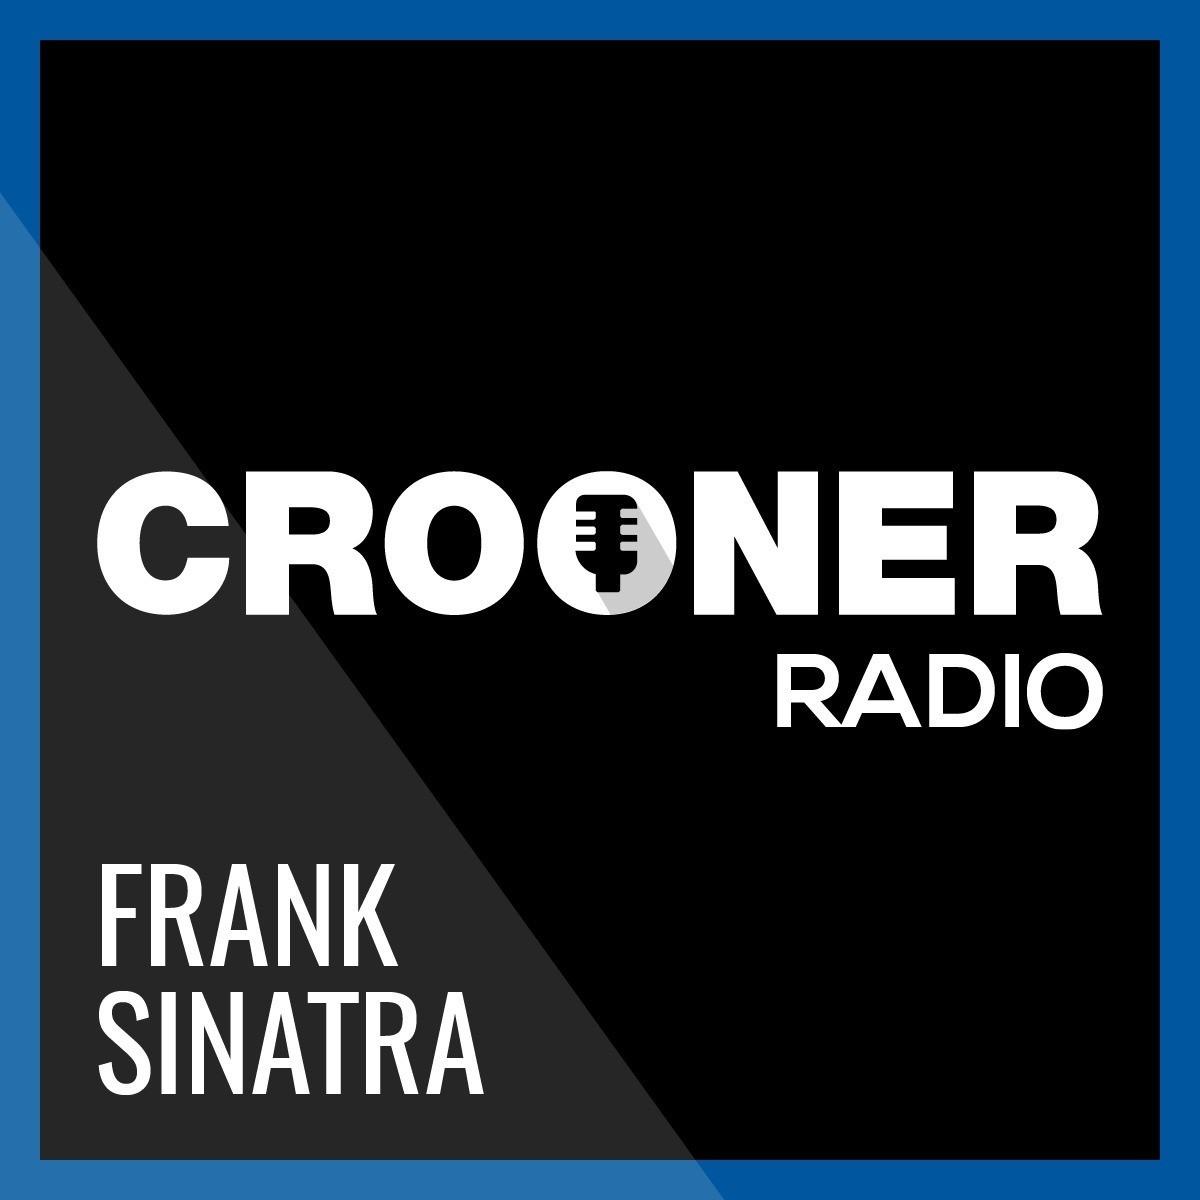 Frank Sinatra - Crooner Radio